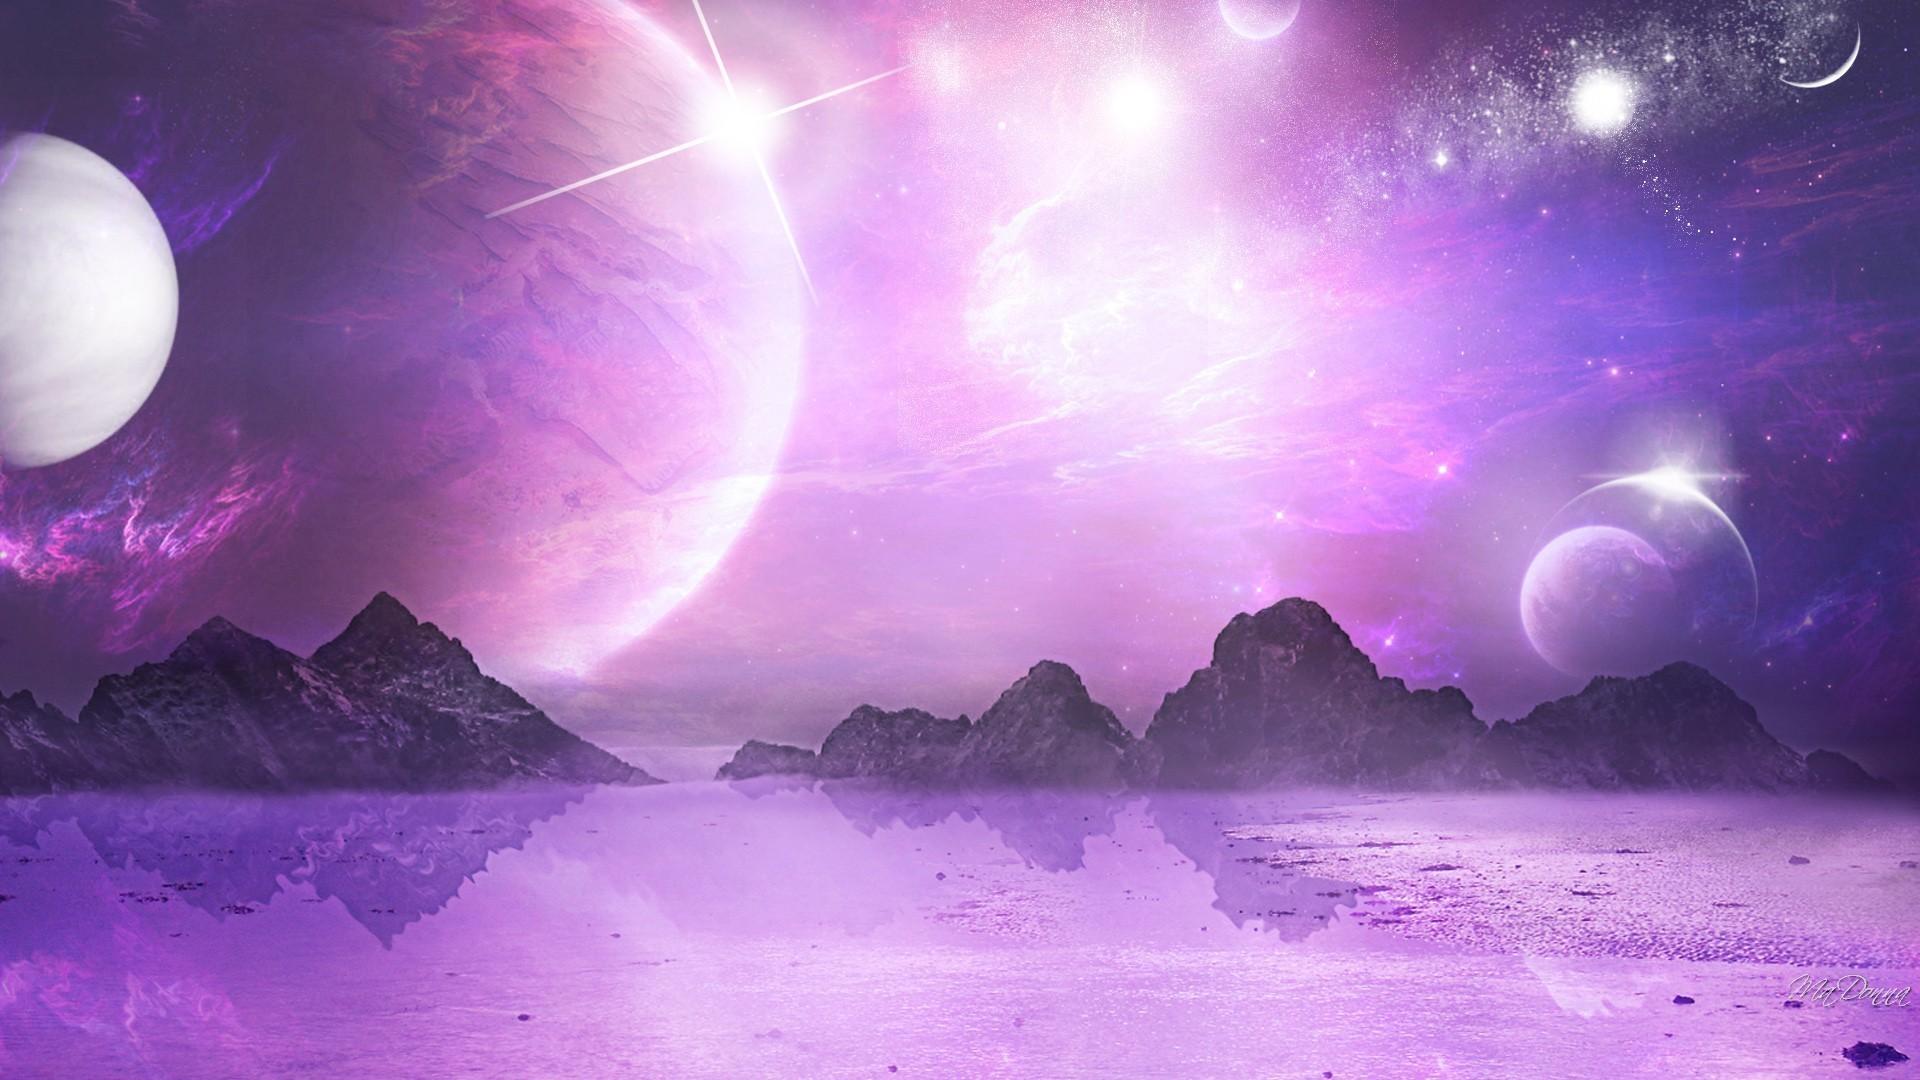 Moon and stars desktop wallpaper 63 images - Purple moon wallpaper ...